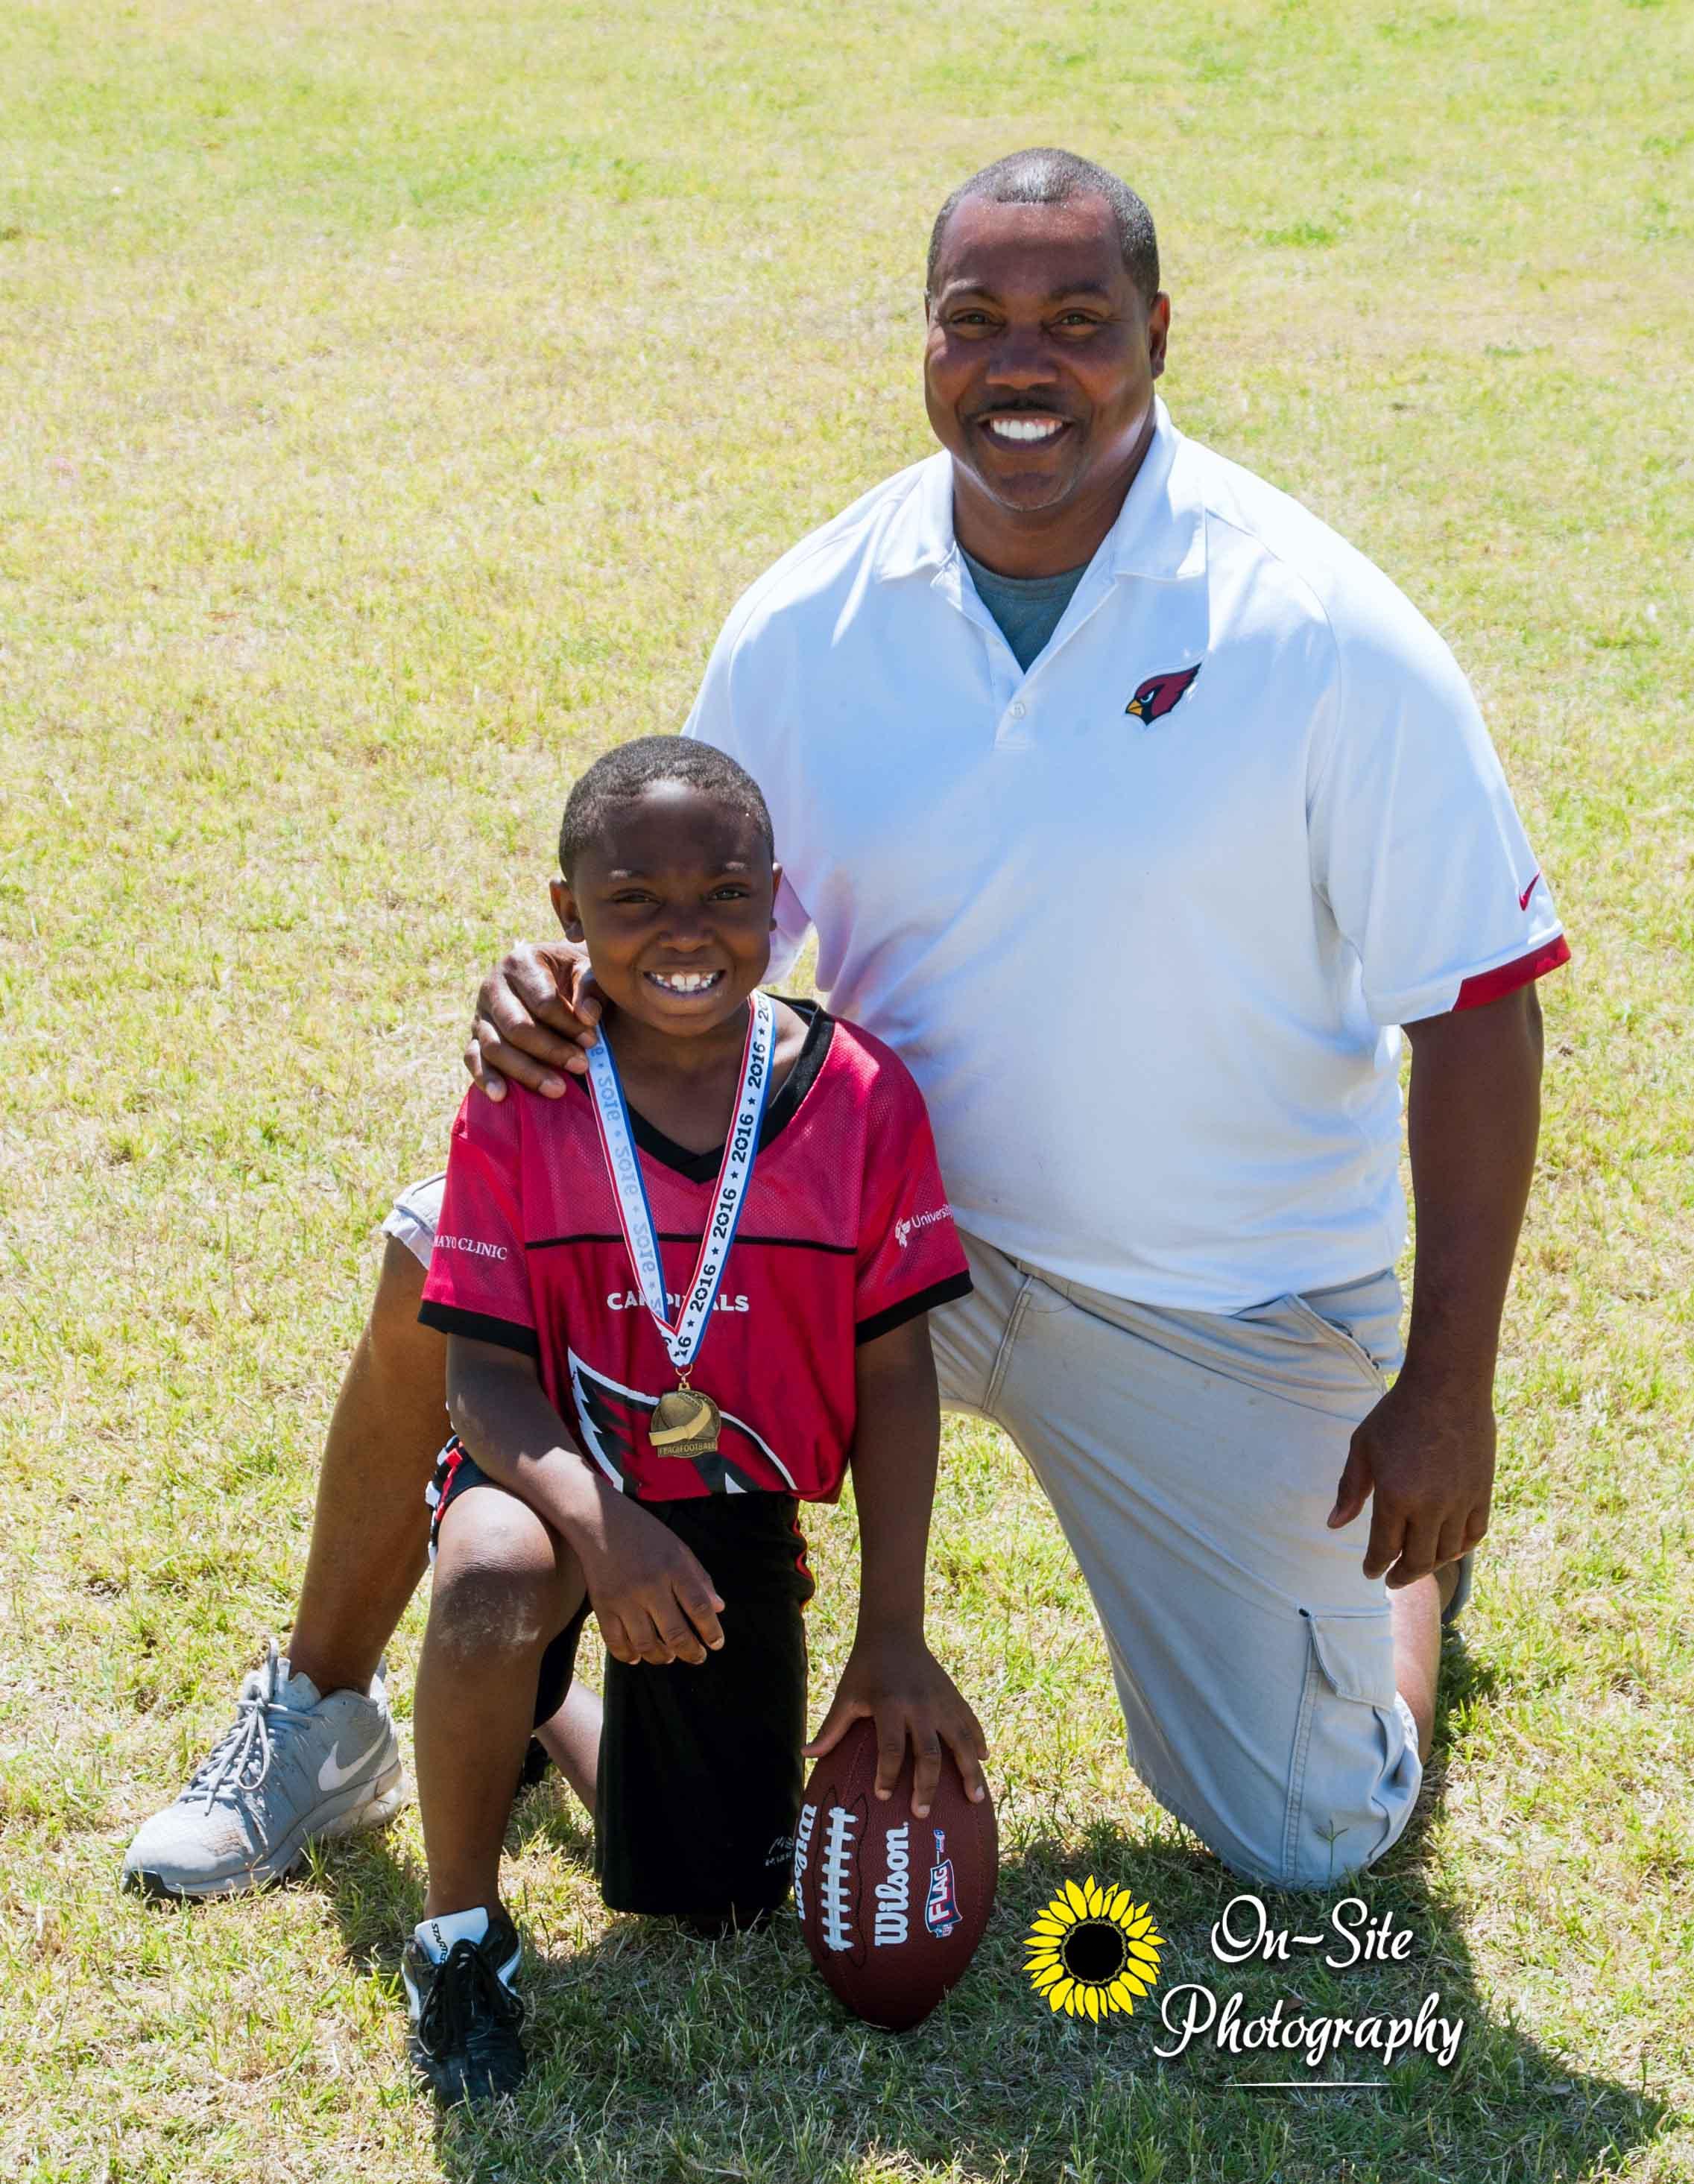 3x5 Coach Photo On-Site Photography Buckeye, Az Sports Photographer